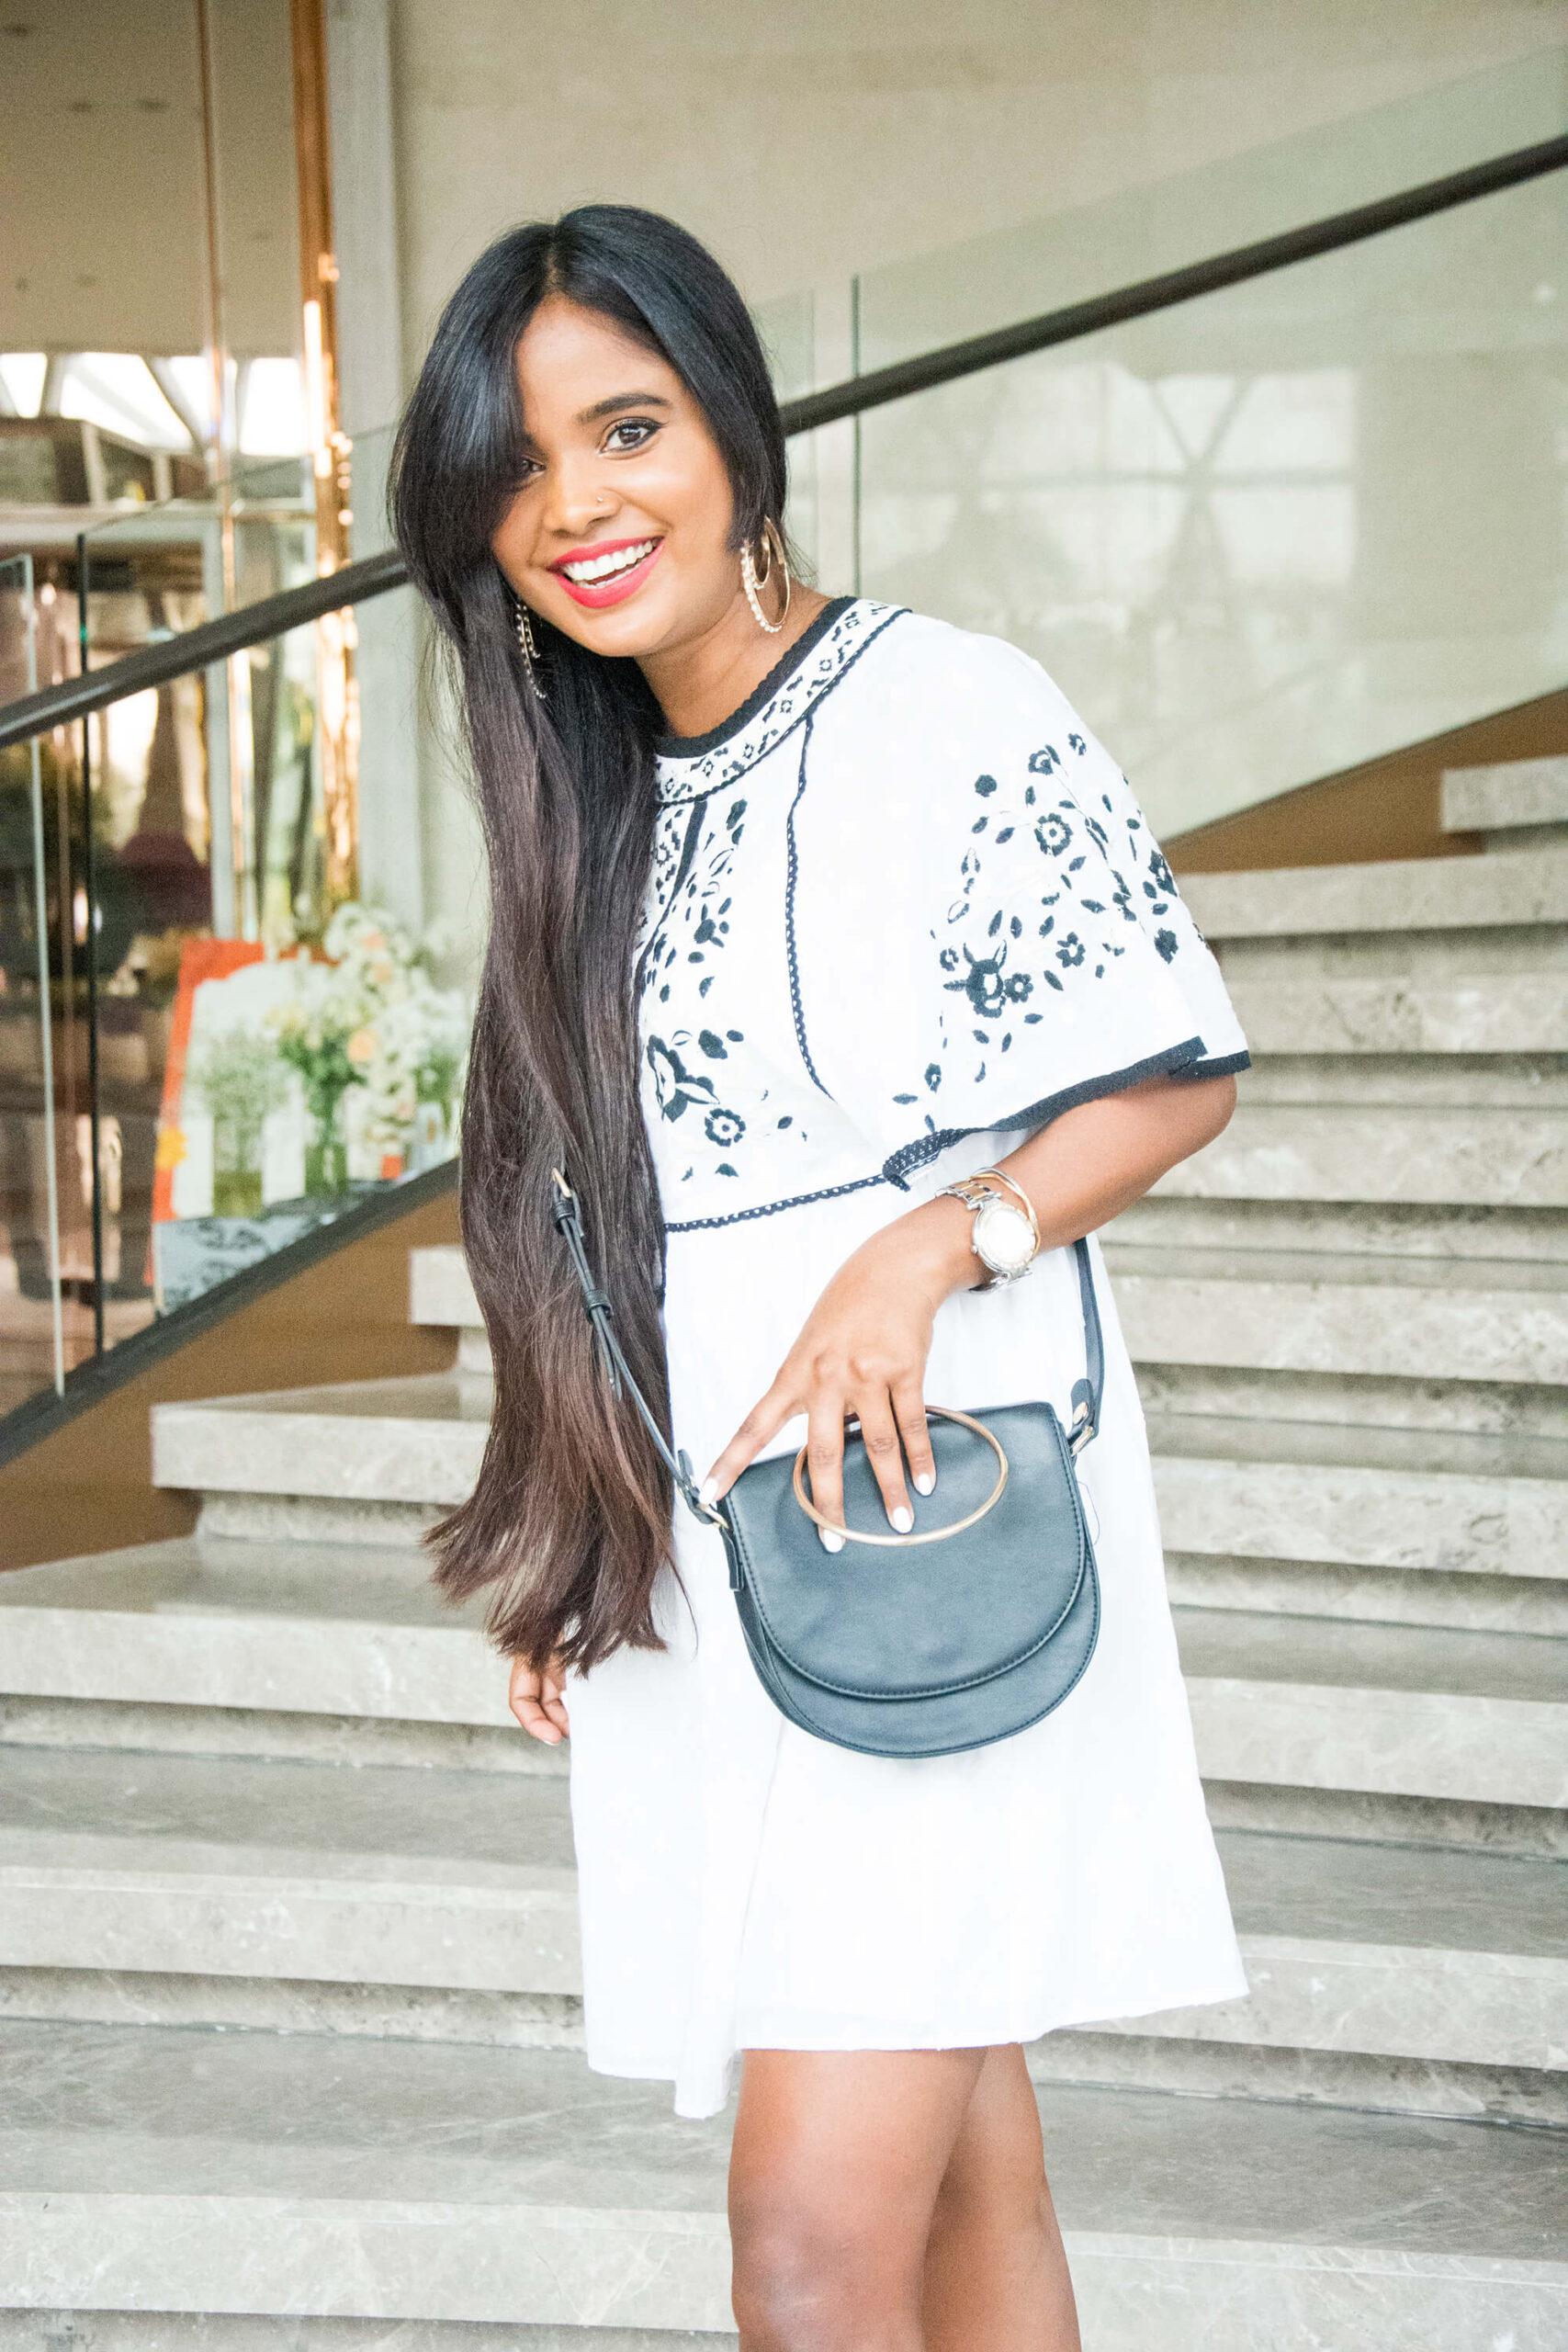 Best flowy white summer dress from Zara